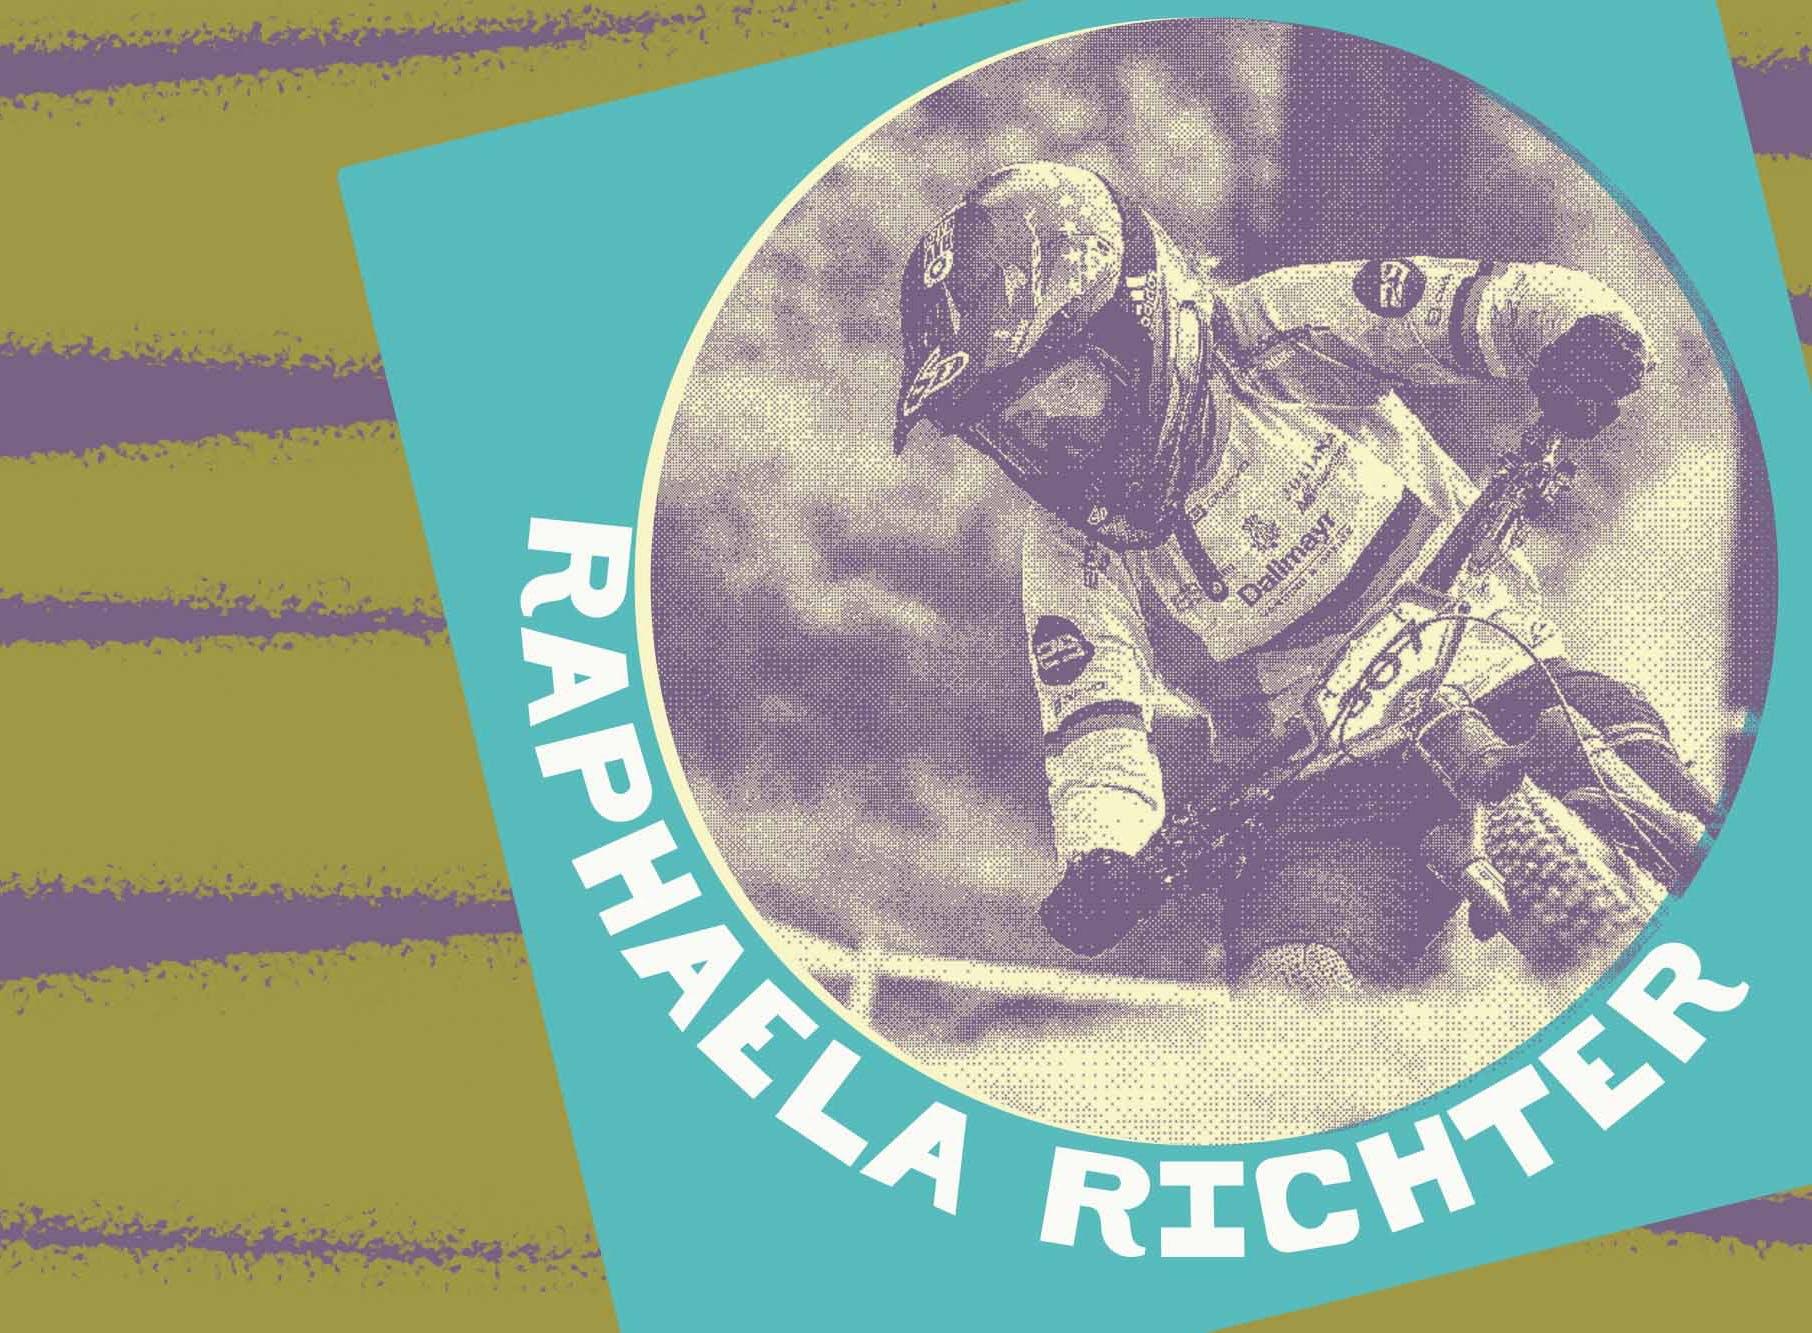 Raphaela Richter